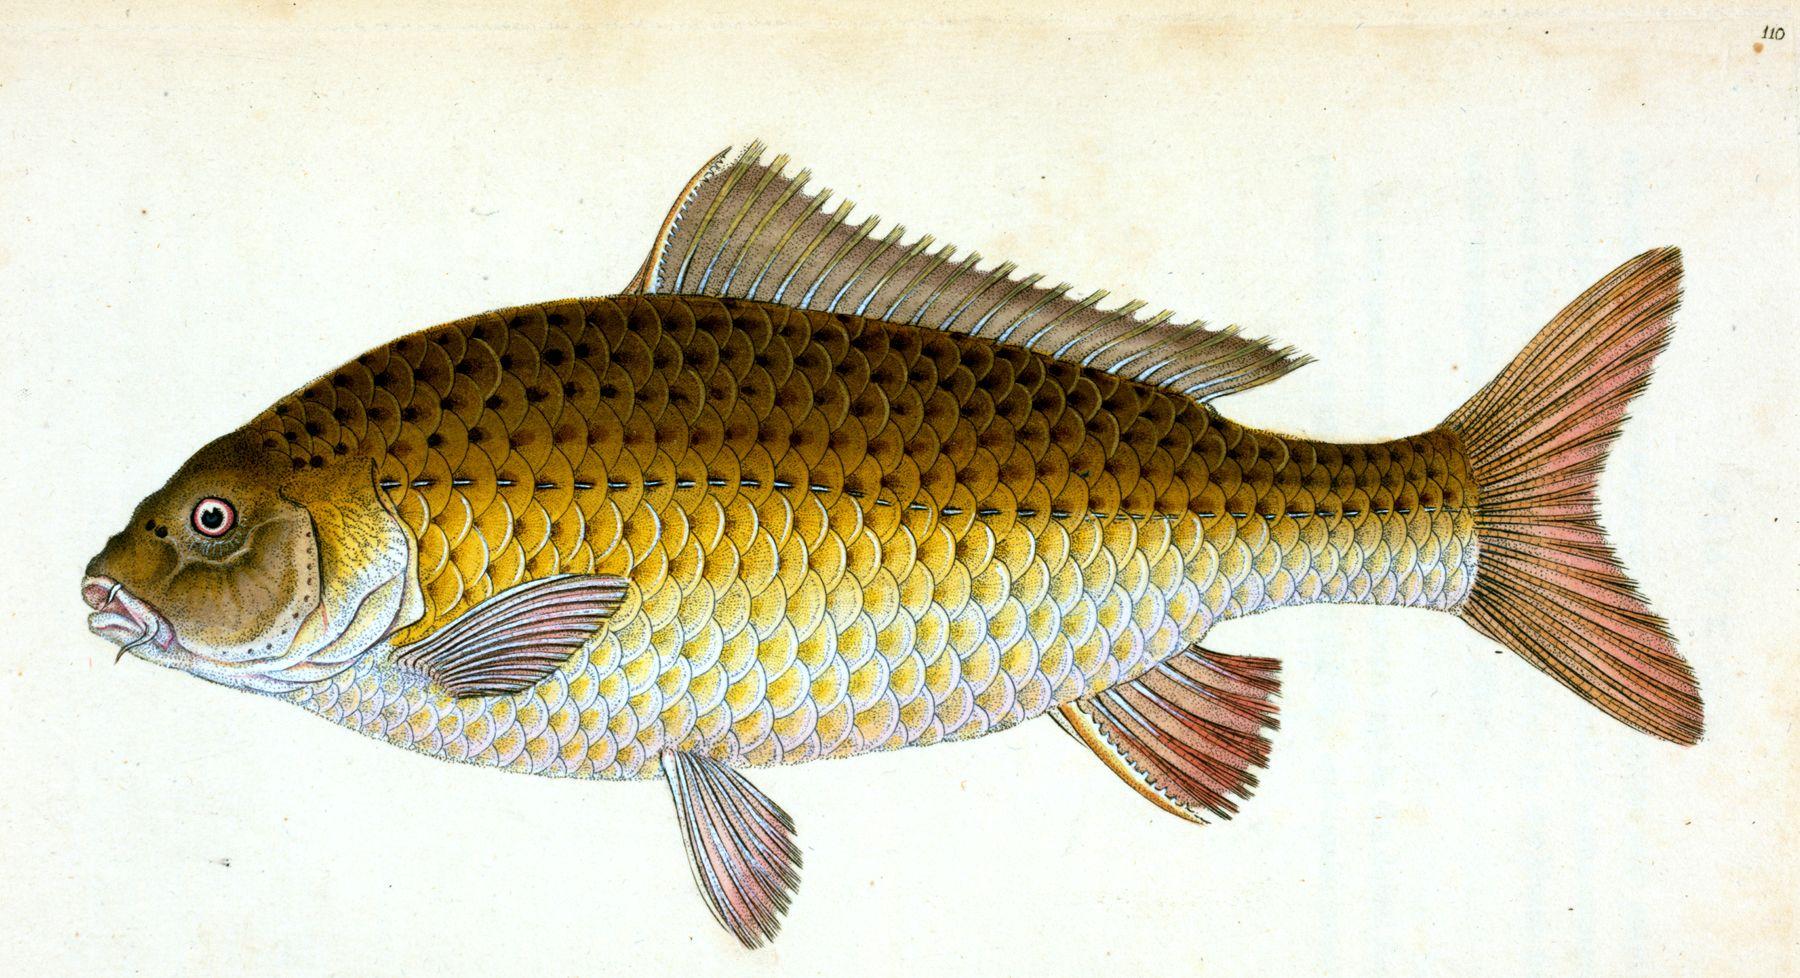 12 Free Fish Clipart Vintage Illustration Fish Clipart Fish